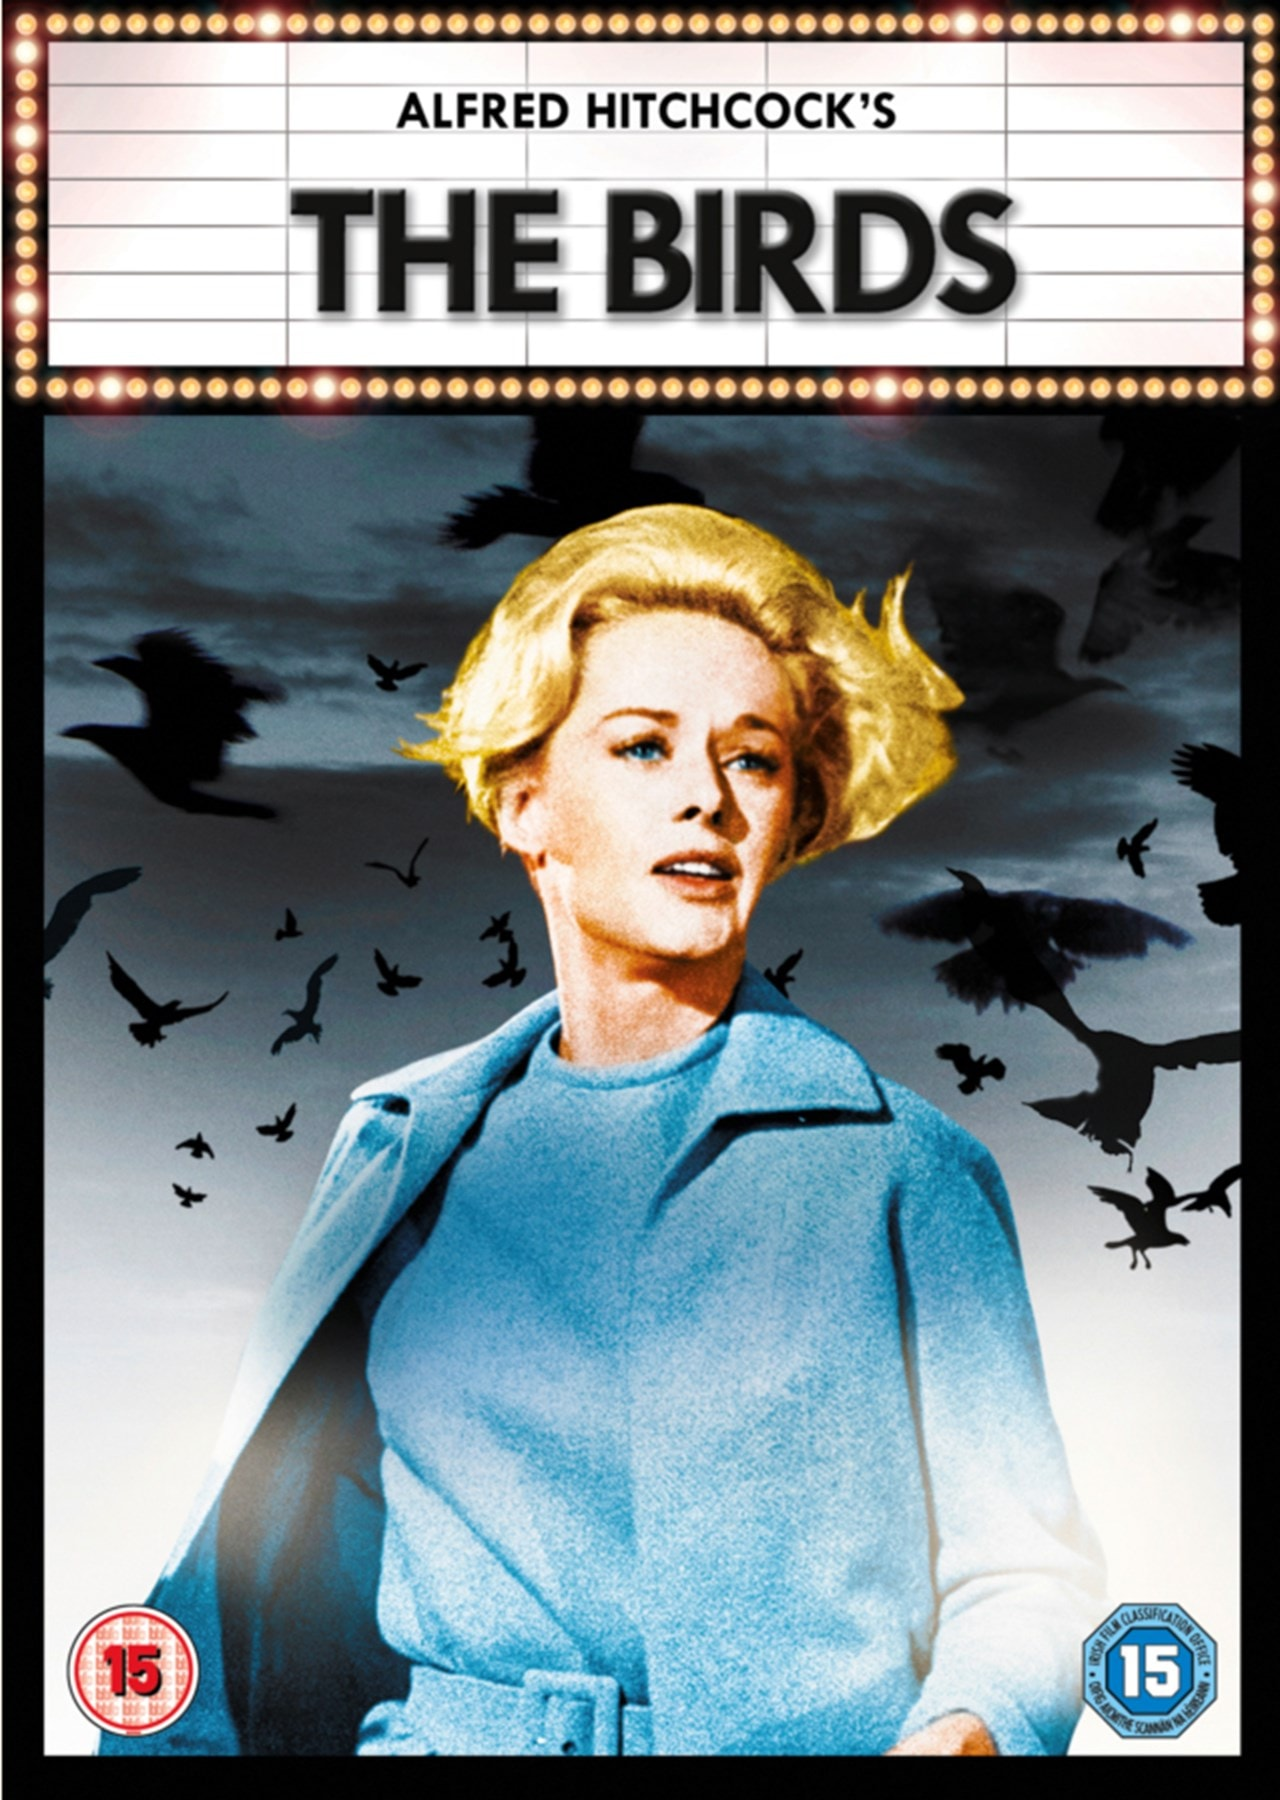 The Birds - 1